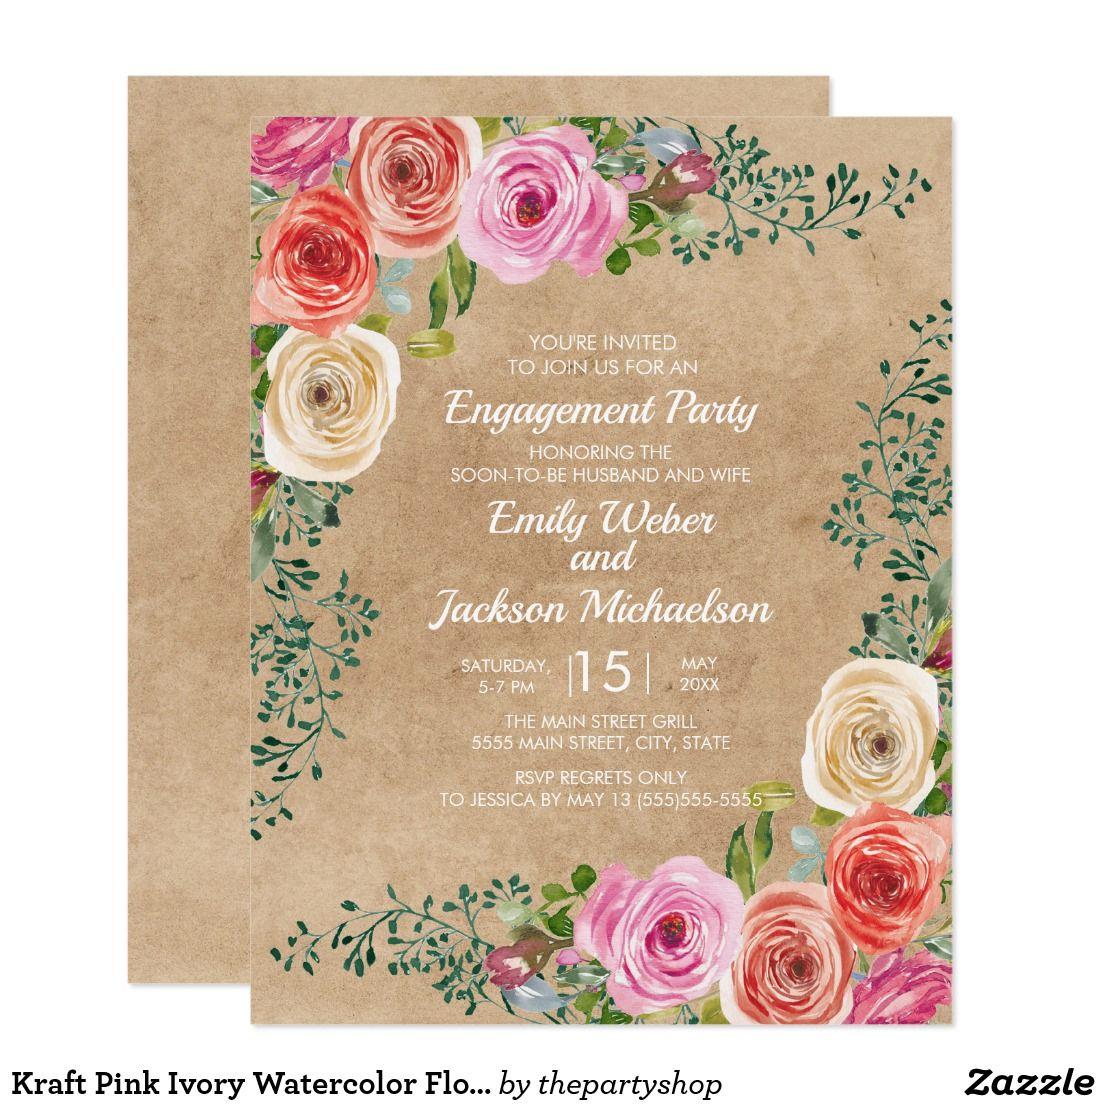 Kraft Pink Ivory Watercolor Floral Engagement Invitation